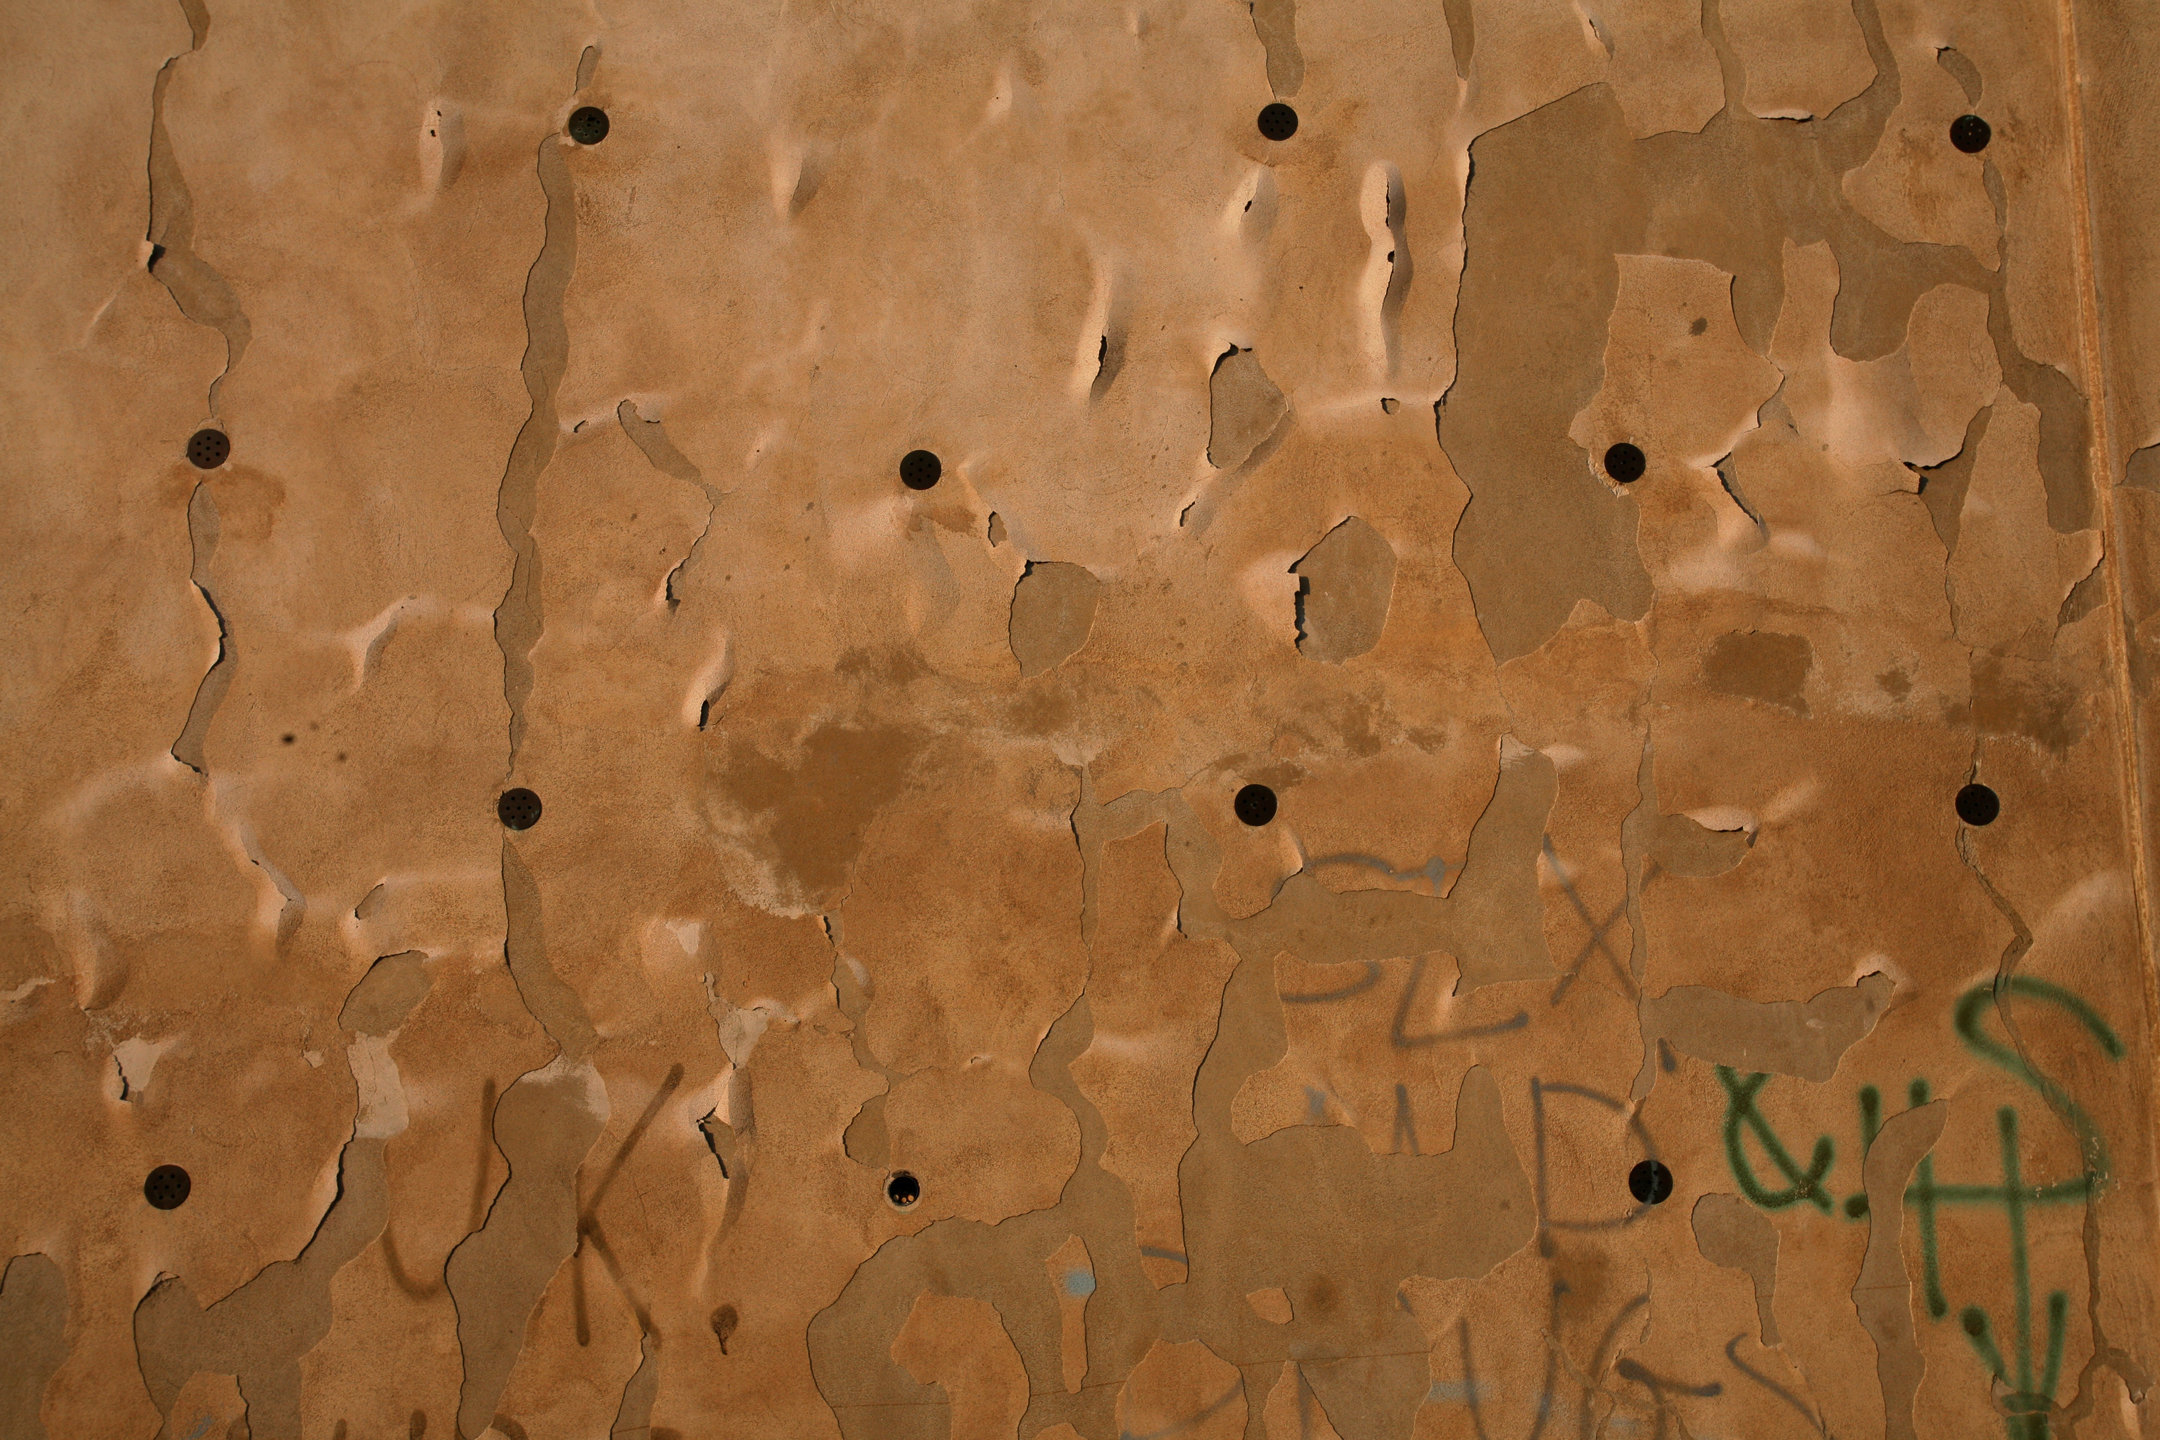 wall_texture_1(2).jpg